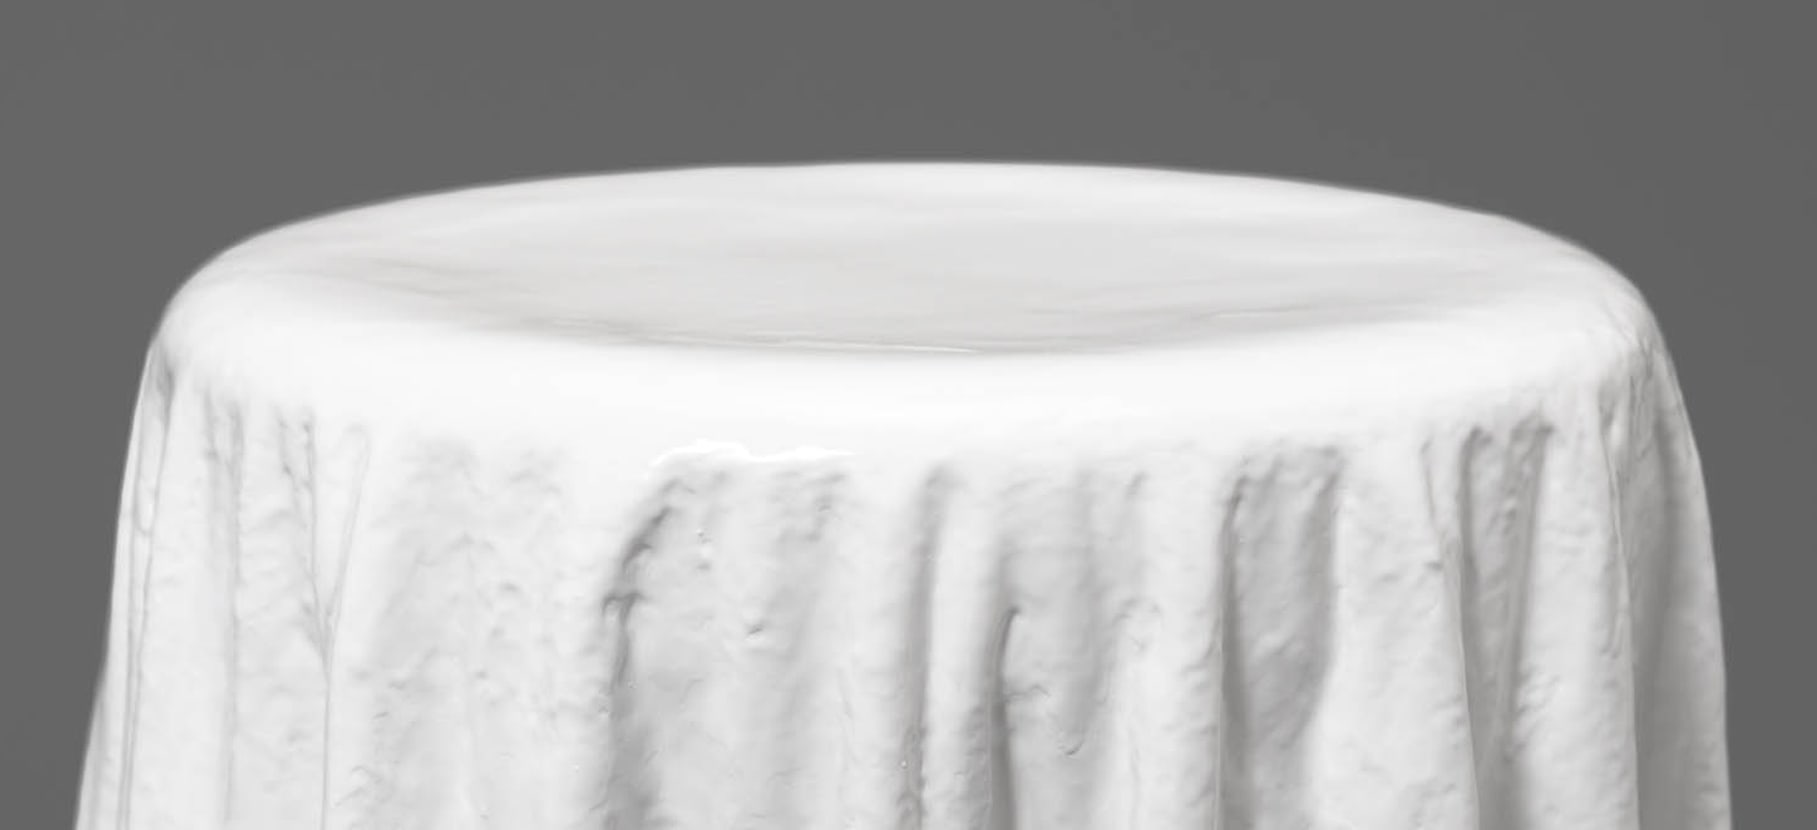 Folded_stool_4